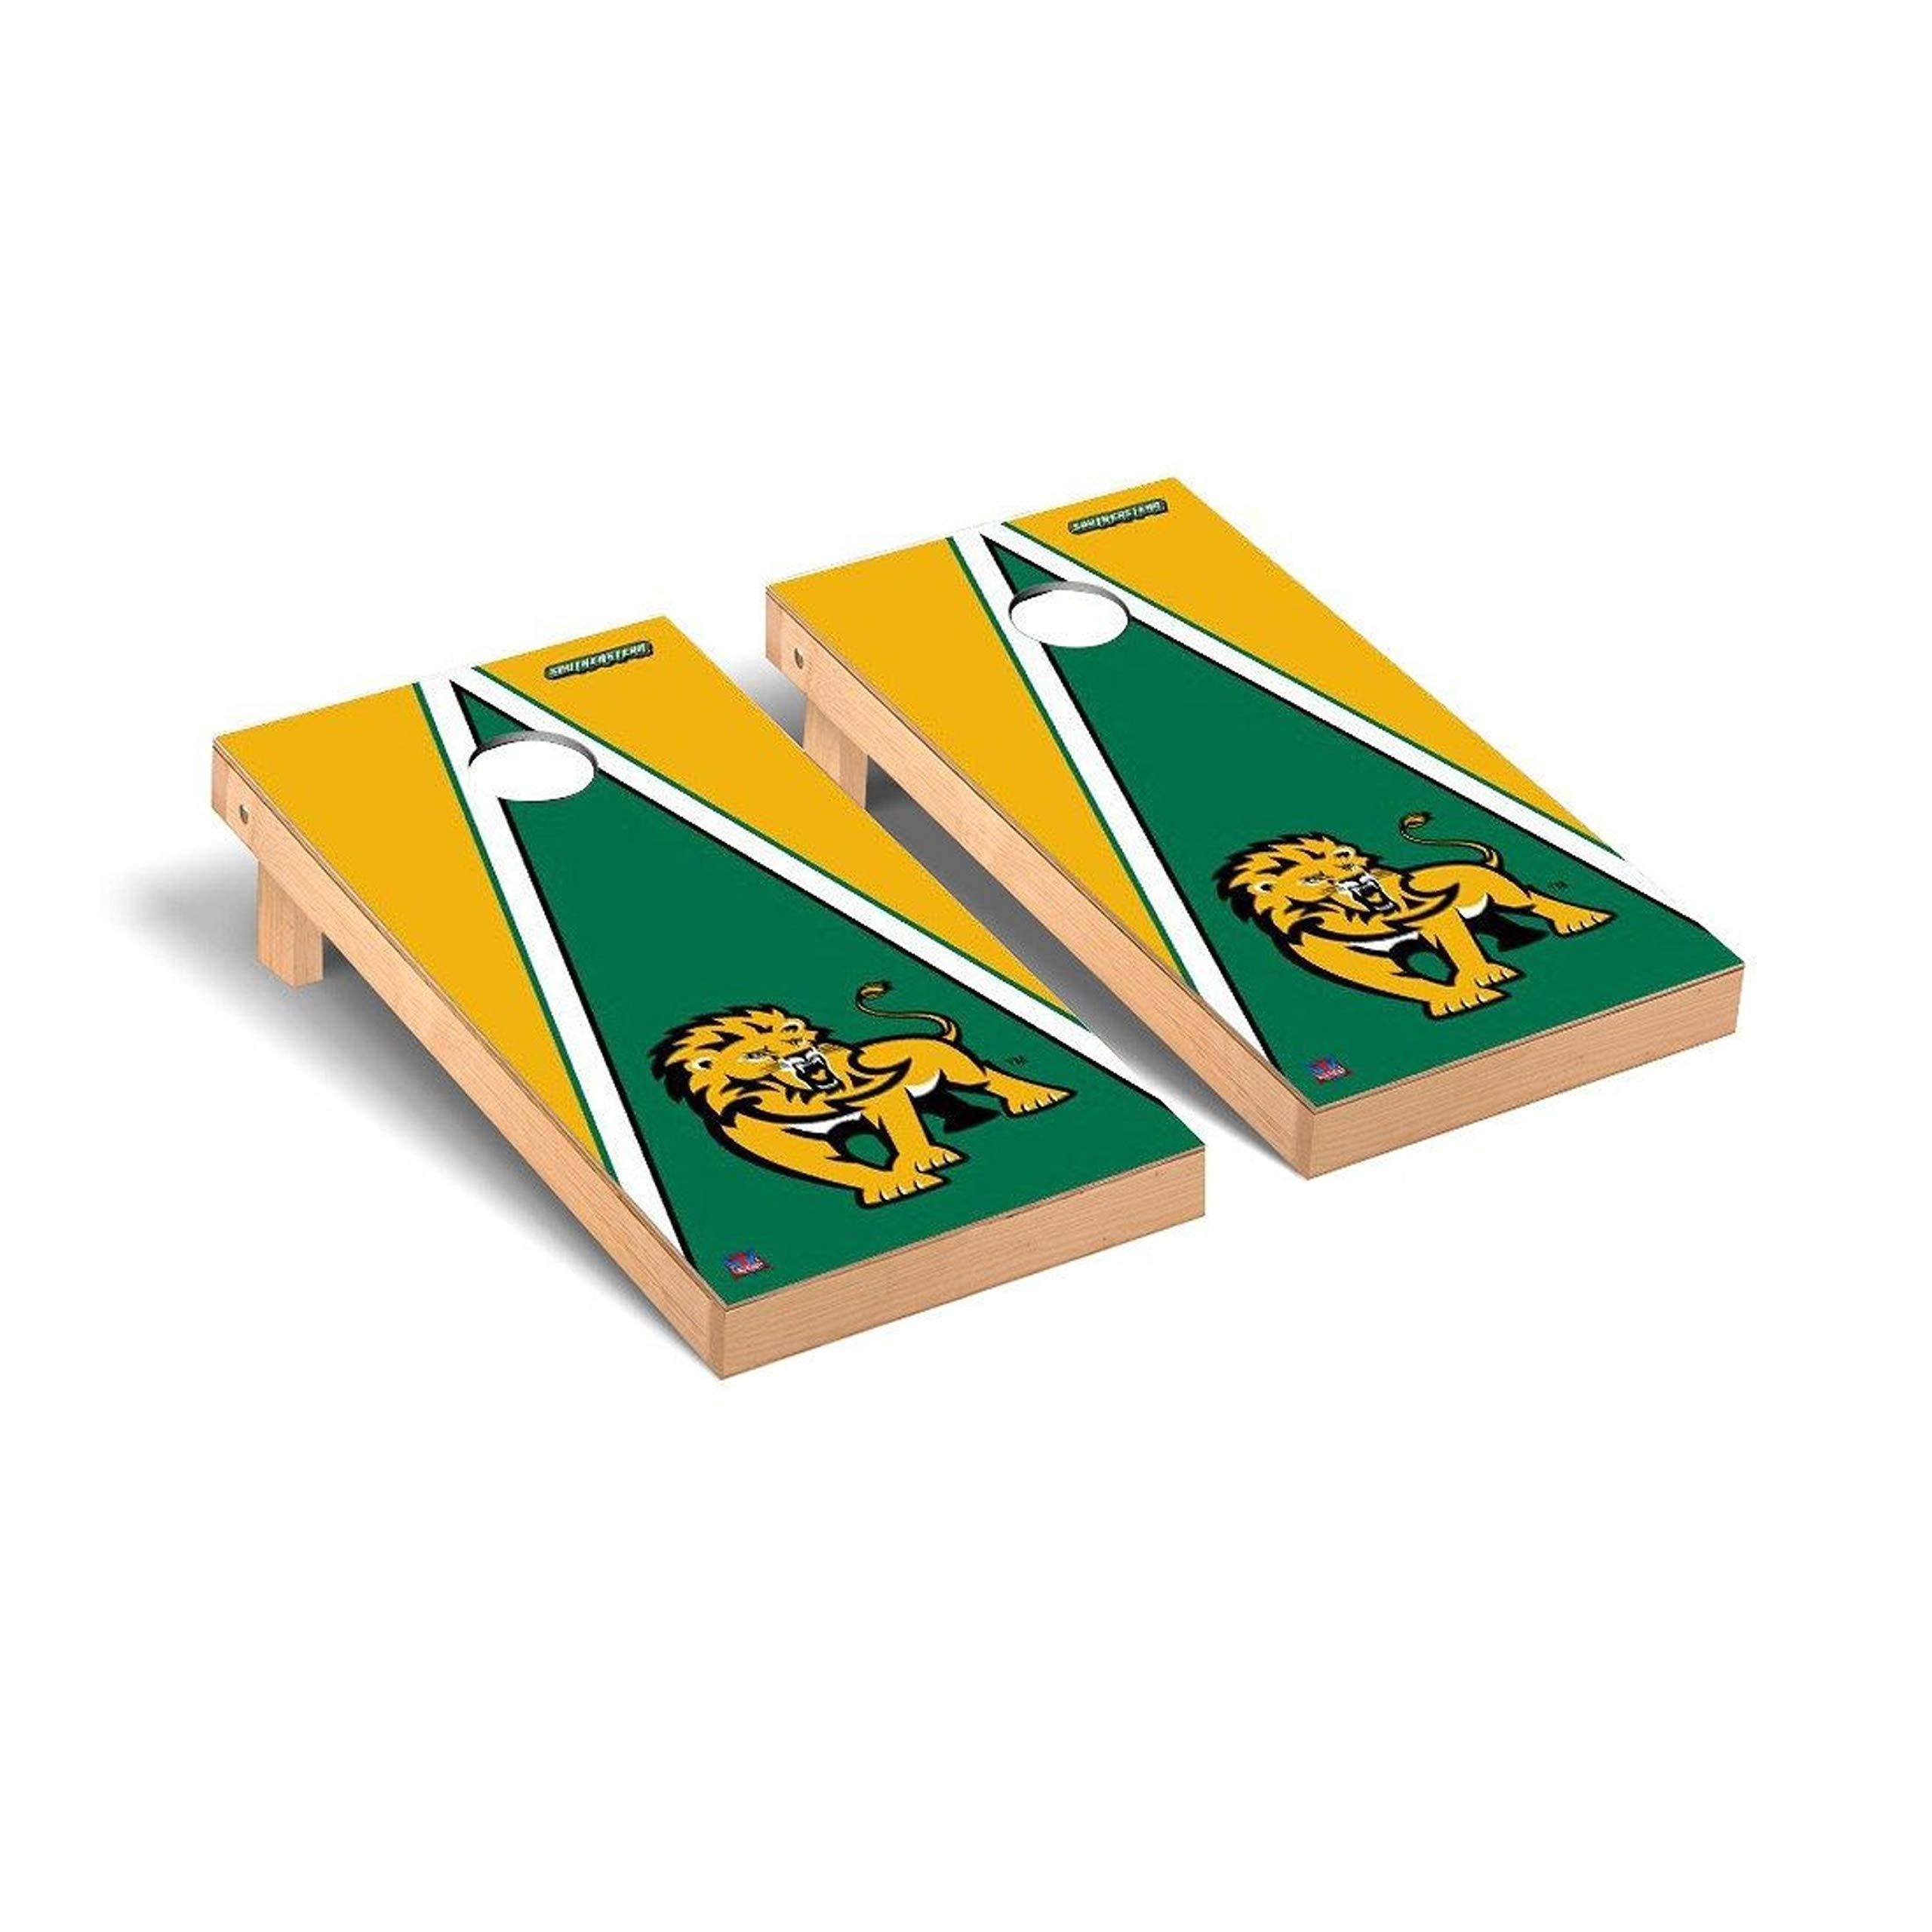 Victory Tailgate Regulation Collegiate NCAA Triangle Series Cornhole Board Set - 2 Boards, 8 Bags - Southeastern Louisiana SLU Lions by Victory Tailgate